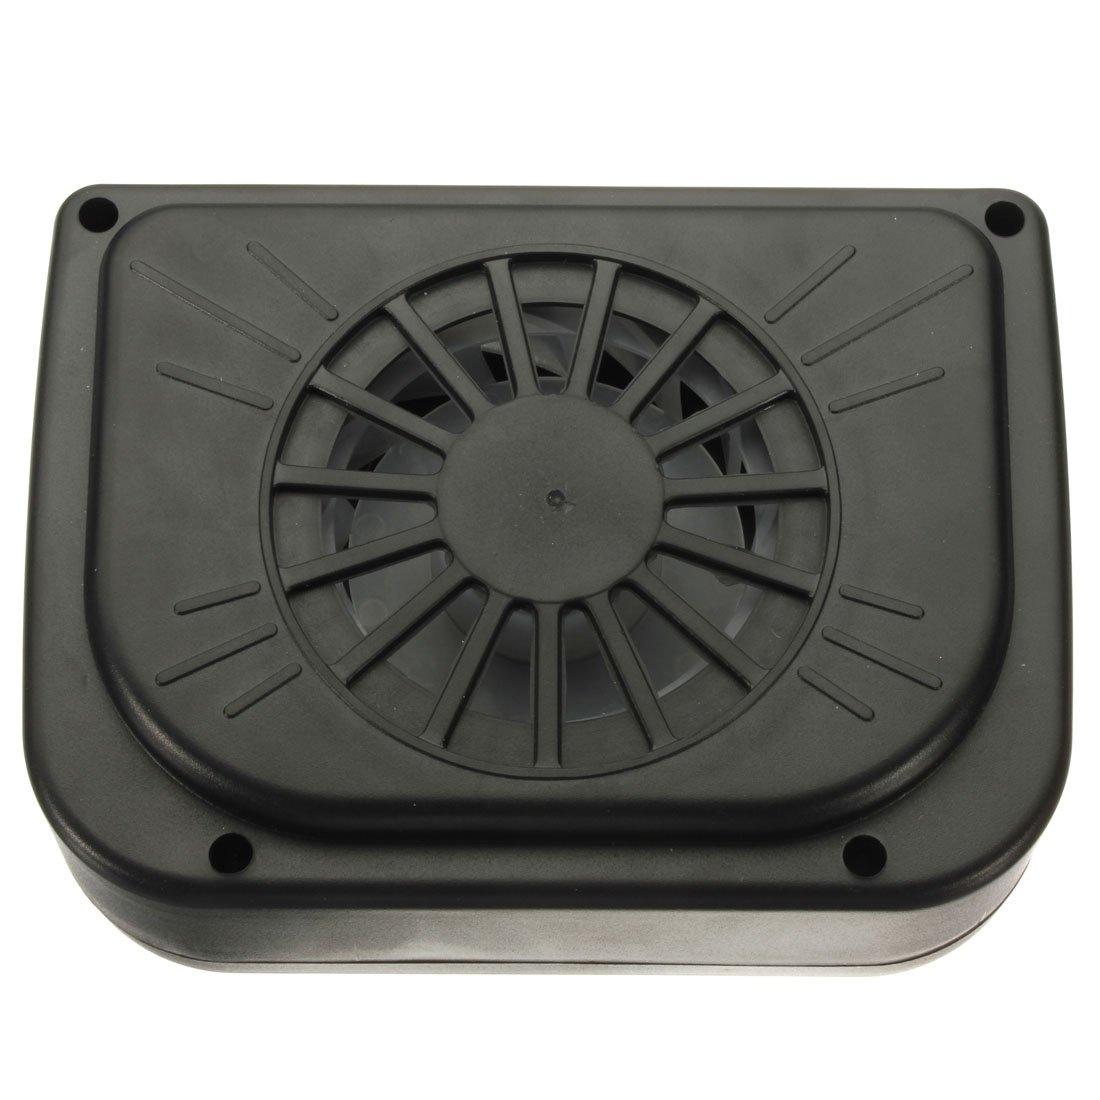 Winnerbe Solar Sun Power Car Auto Air Vent Cool Fan Cooler Ventilation System Radiator